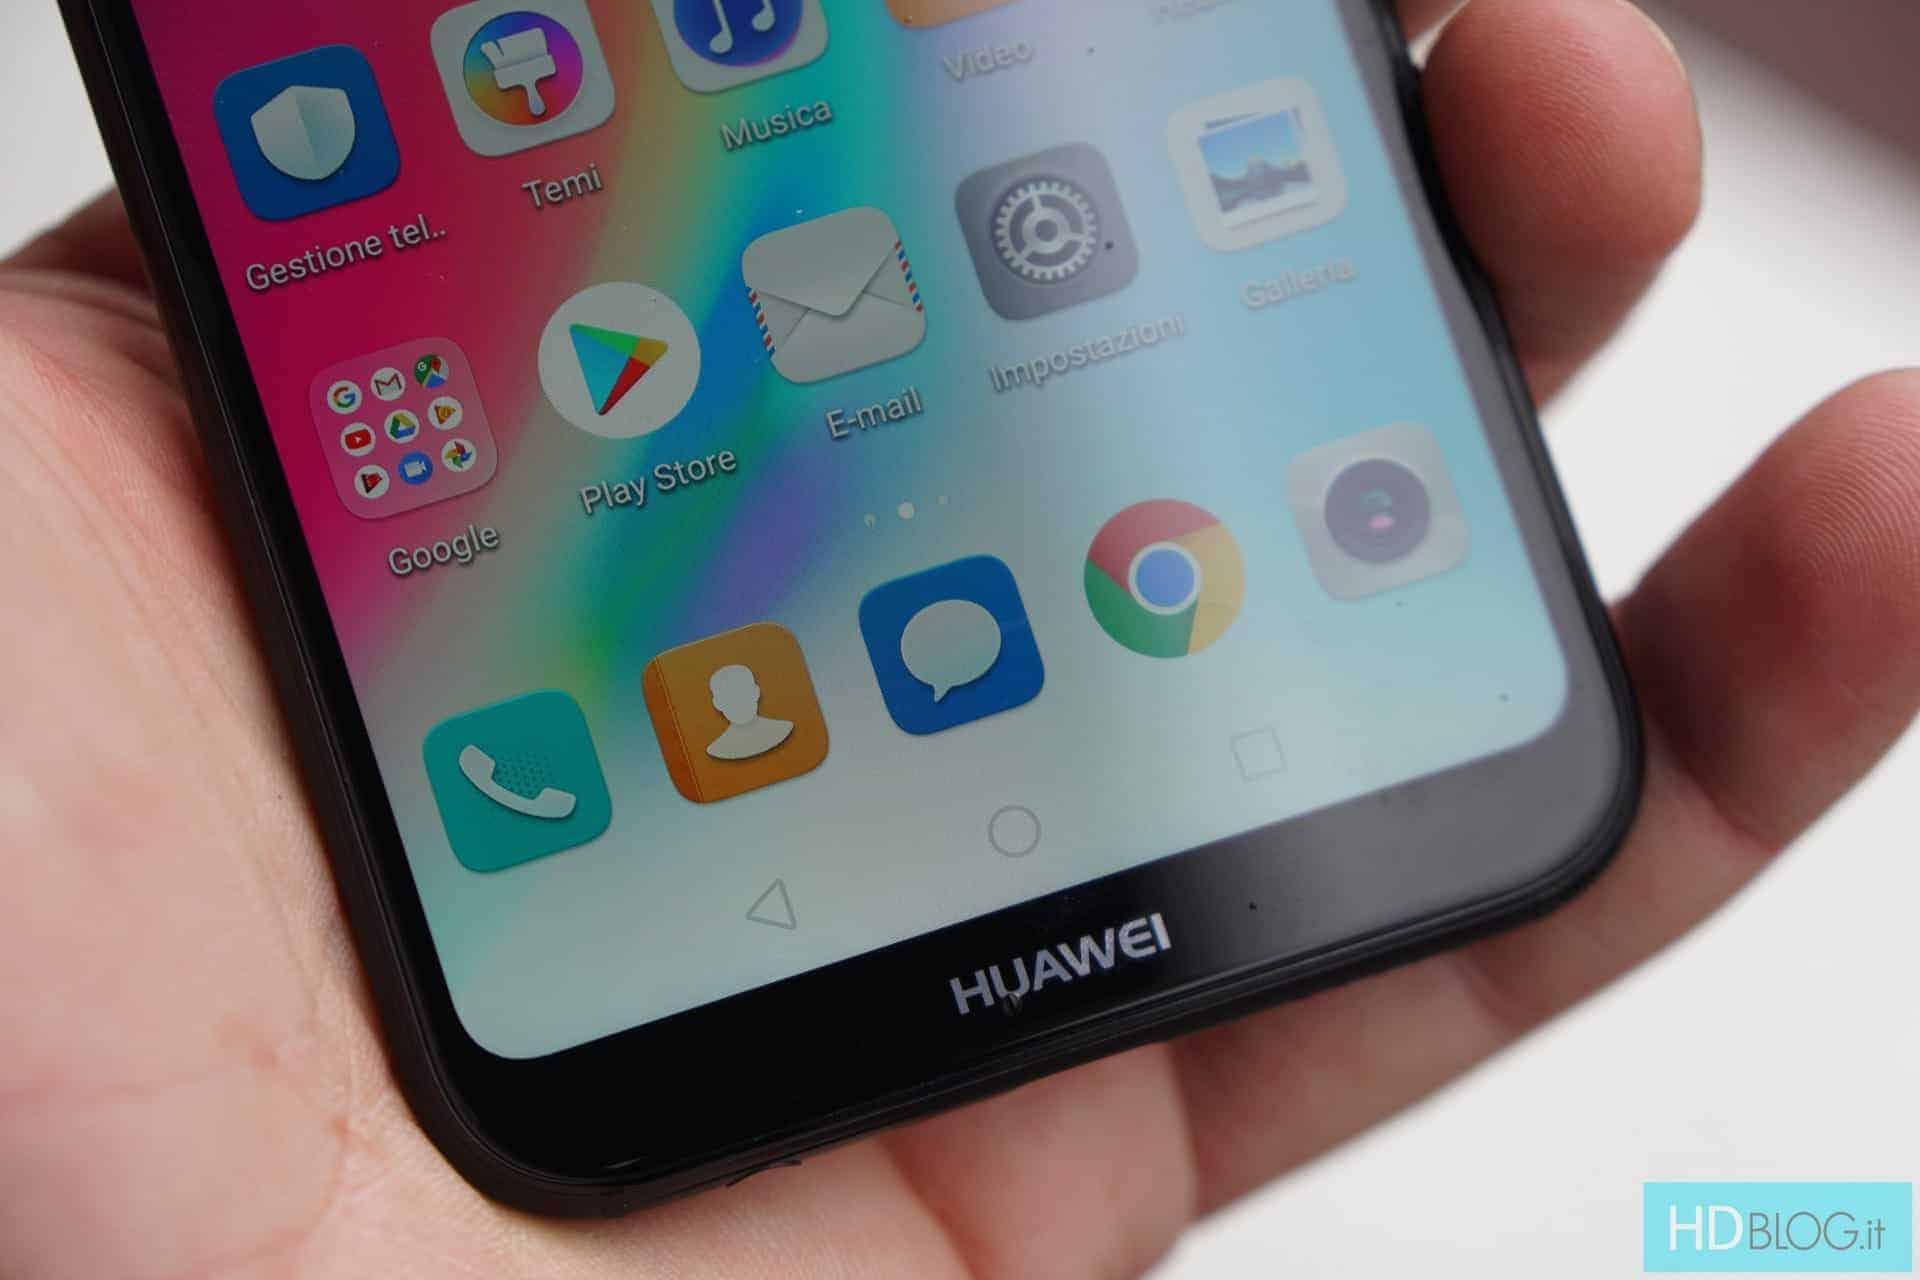 Huawei P20 Lite HDBlog image prelaunch 39